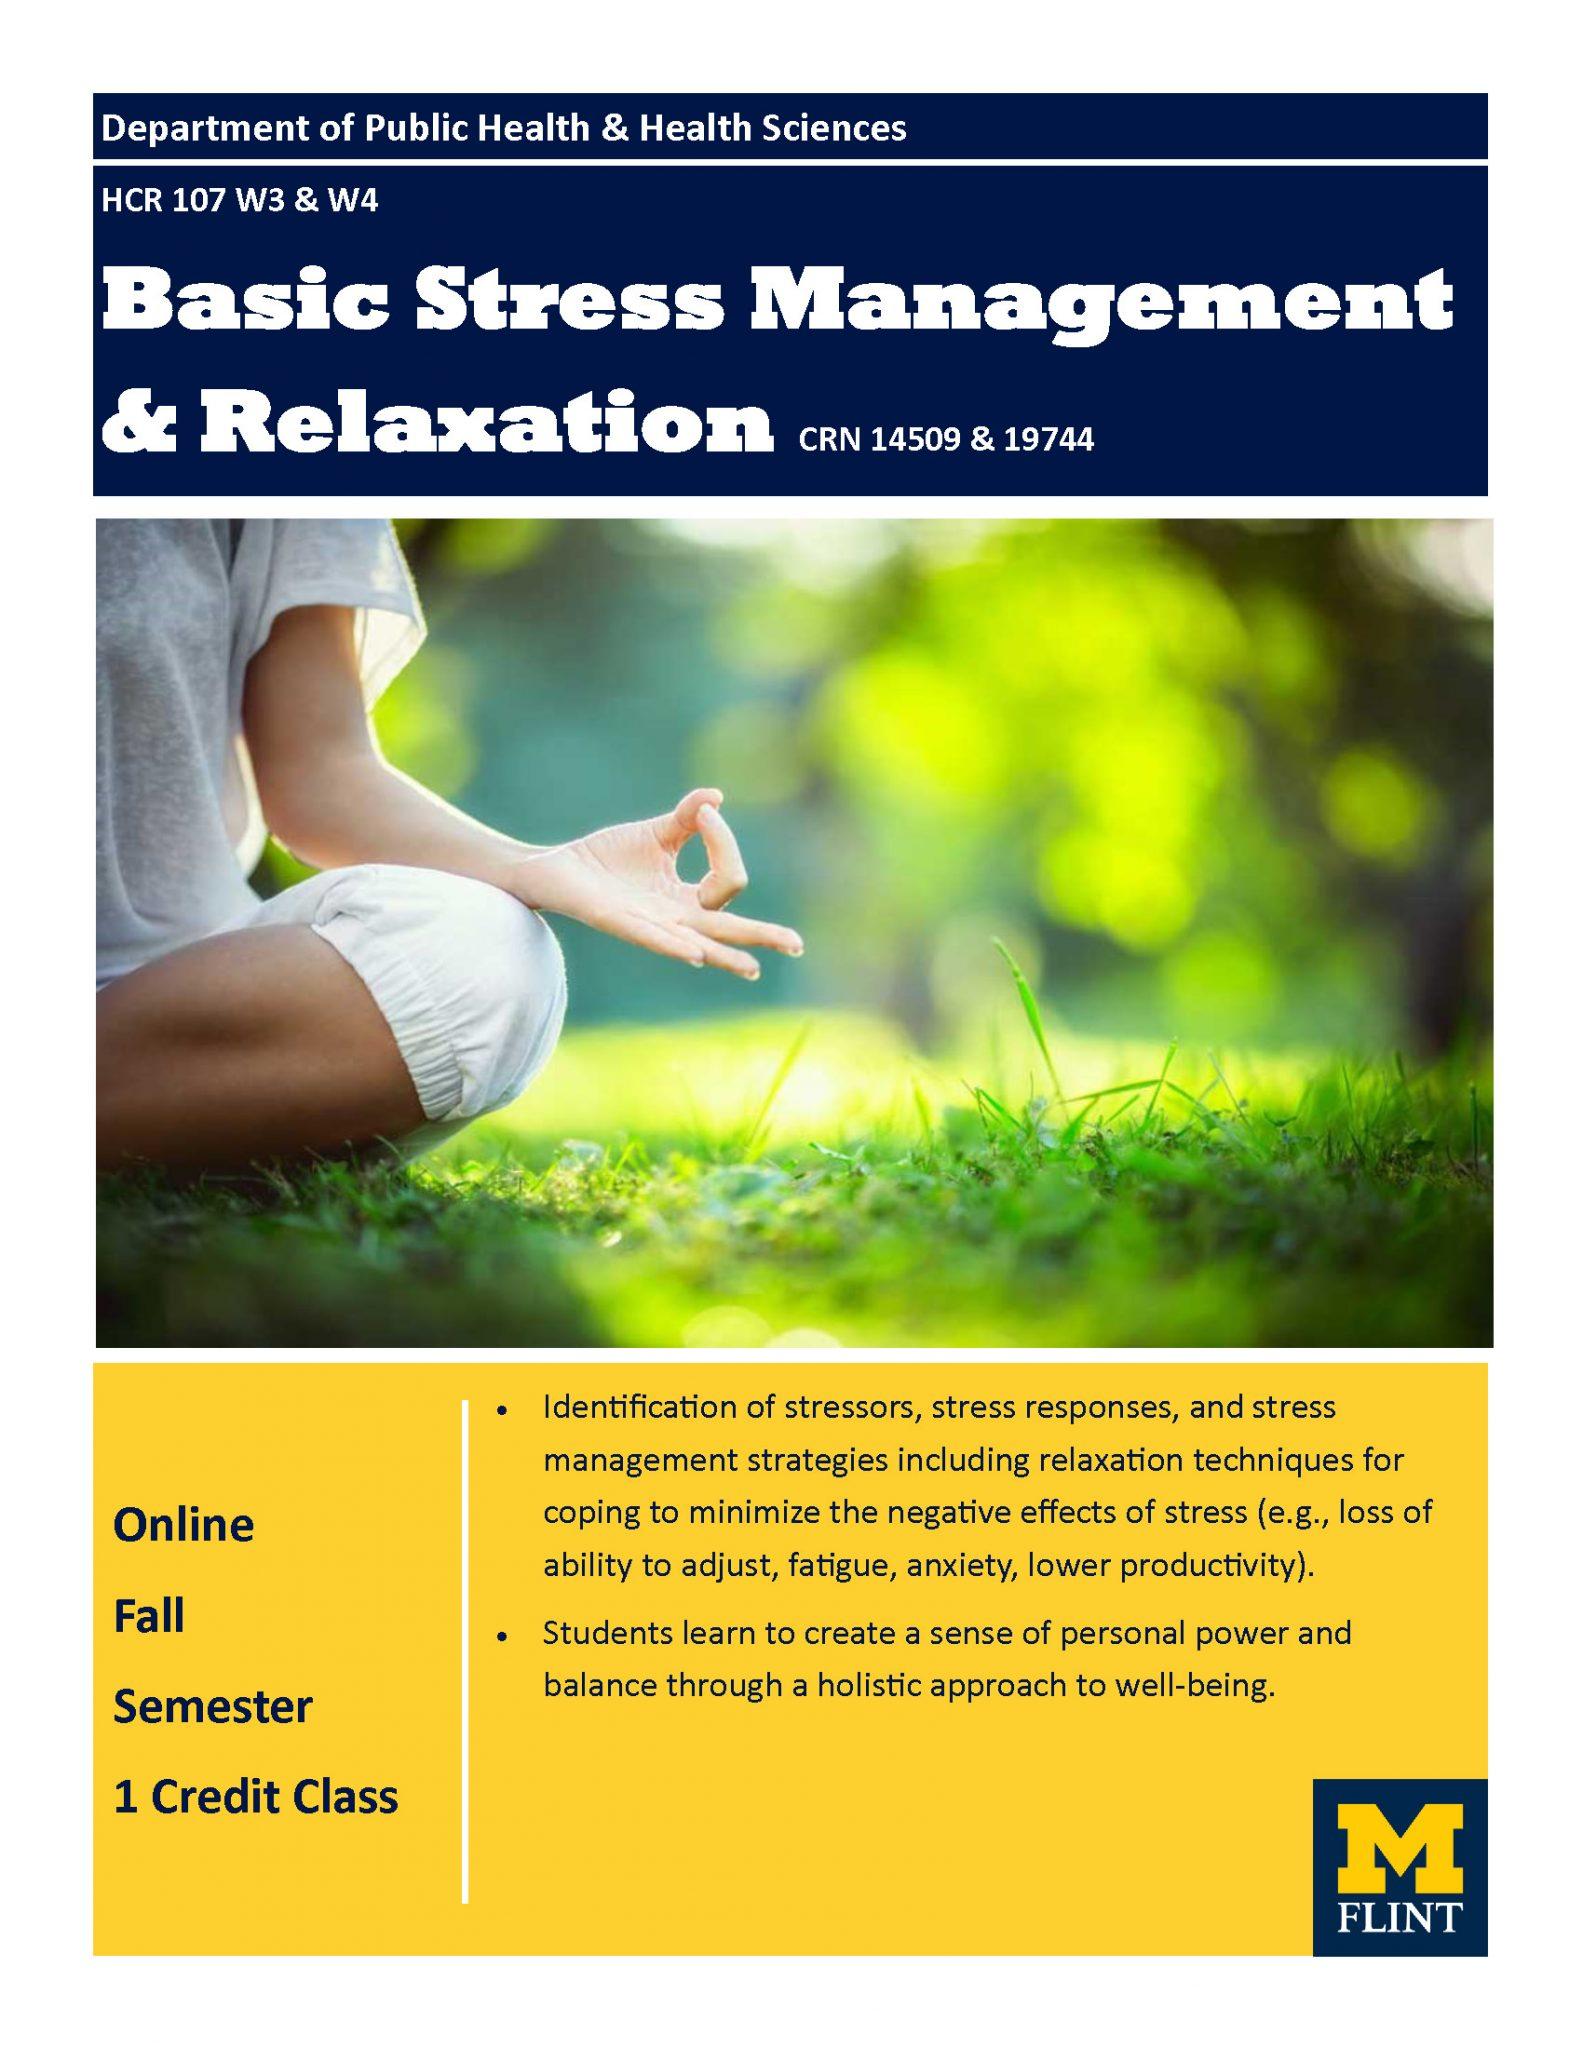 HCR 107 W3 & W4 Basic Stress Management & Relaxation CRN 14509 & 19744